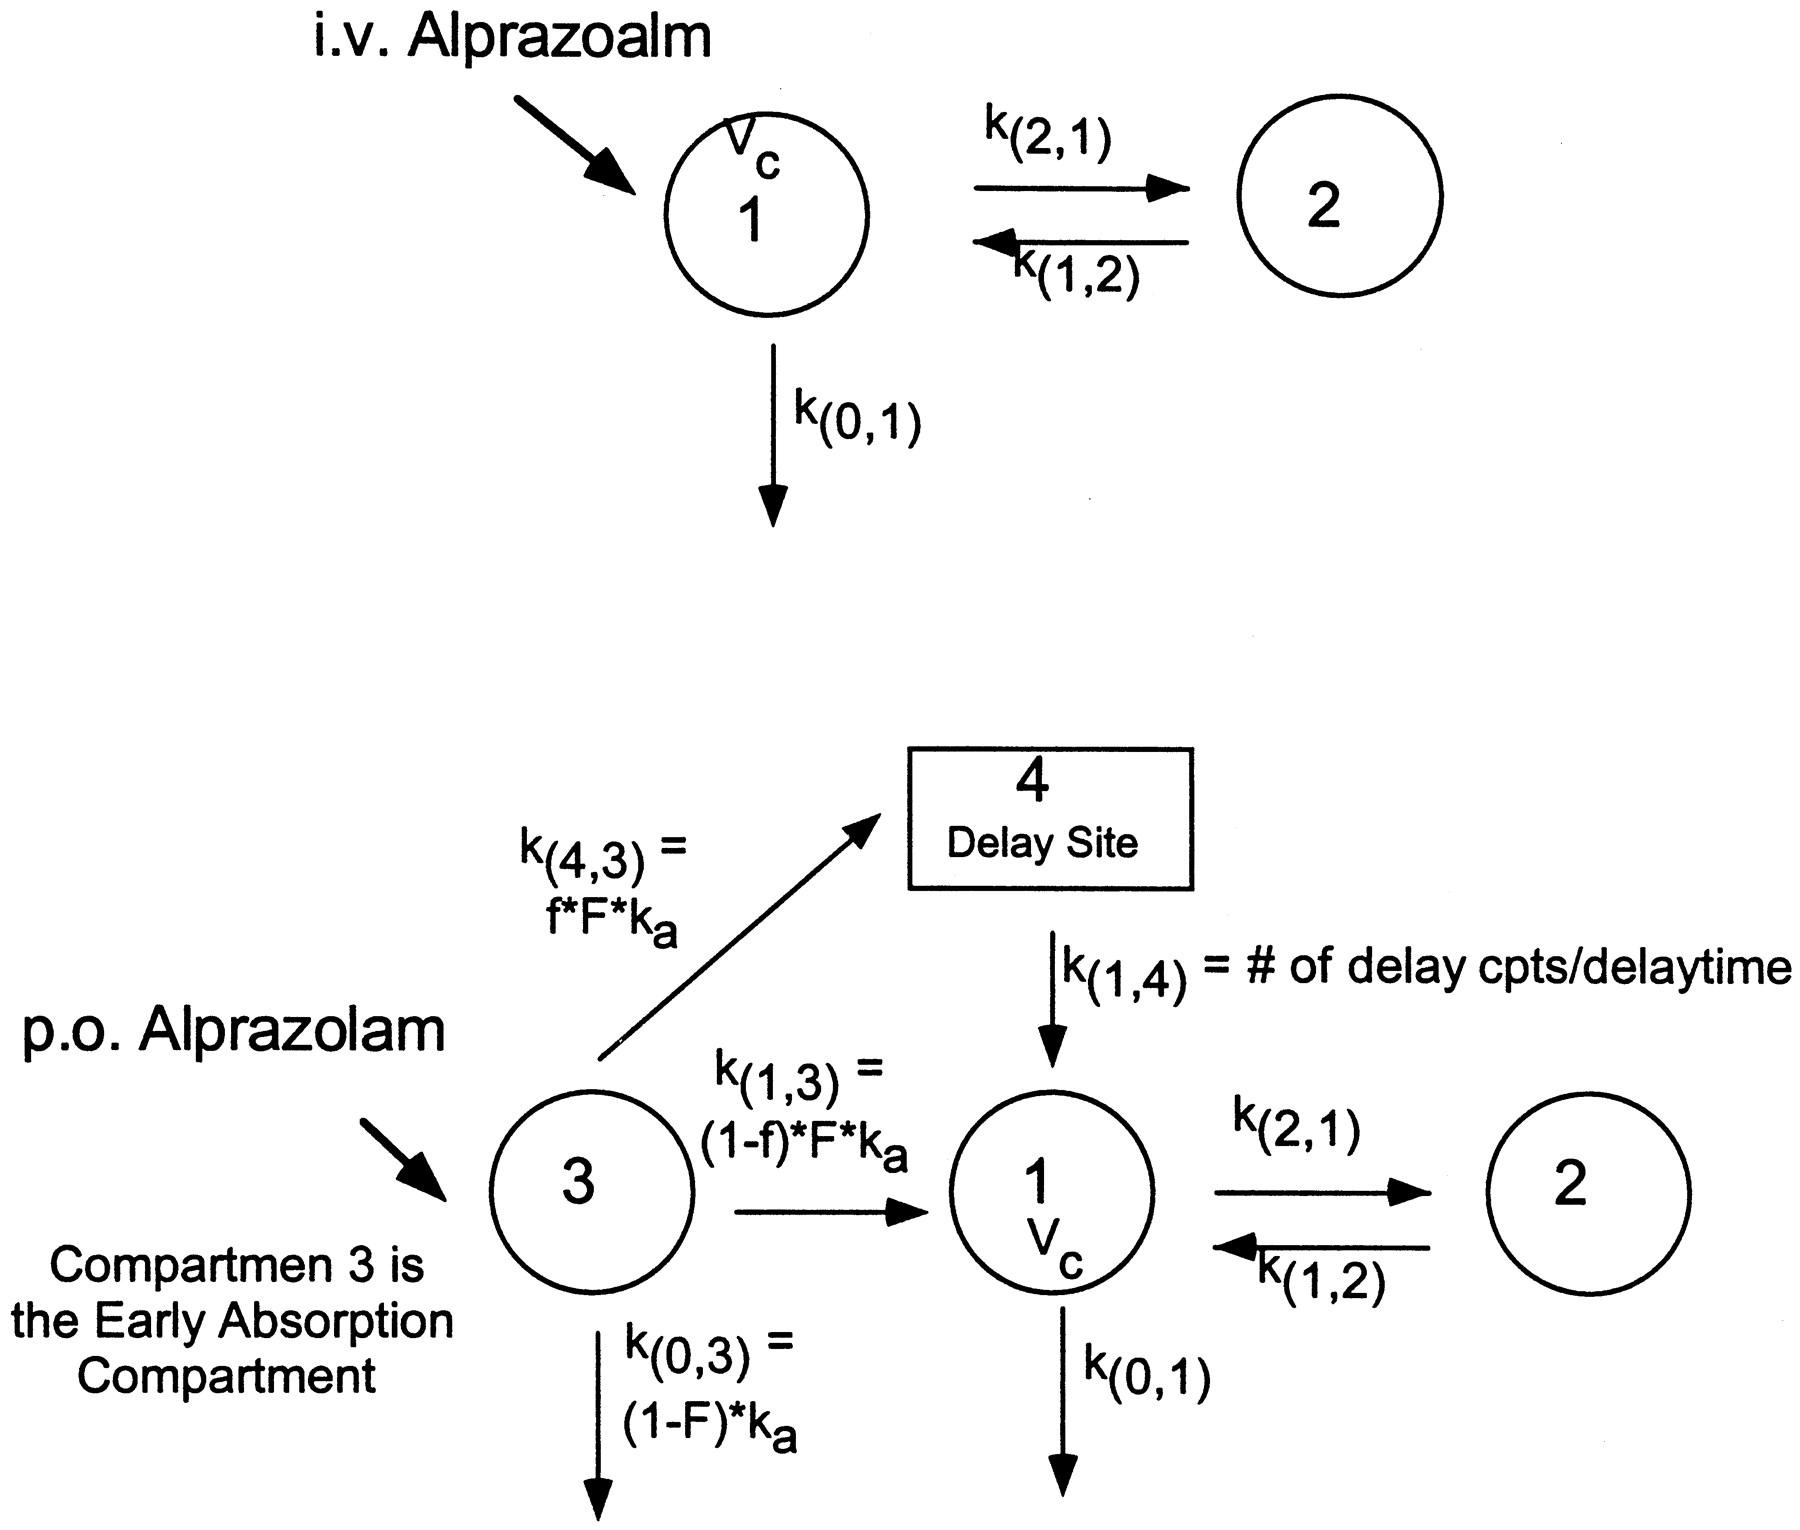 A Double-Peak Phenomenon in the Pharmacokinetics of